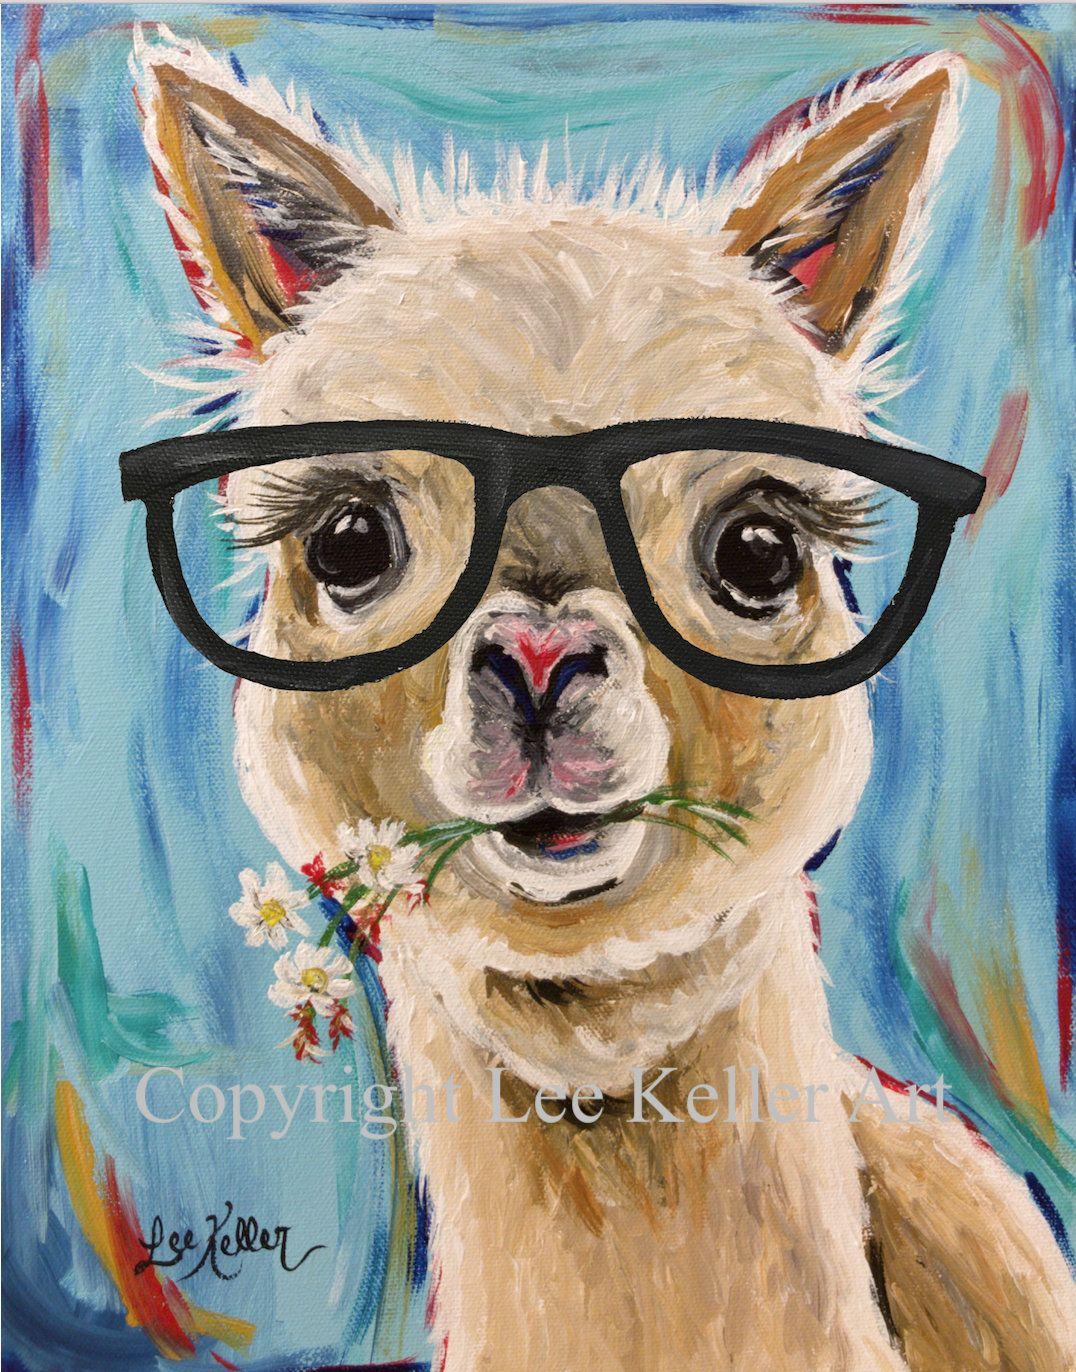 b53a6b18d957 Alpaca with glasses art